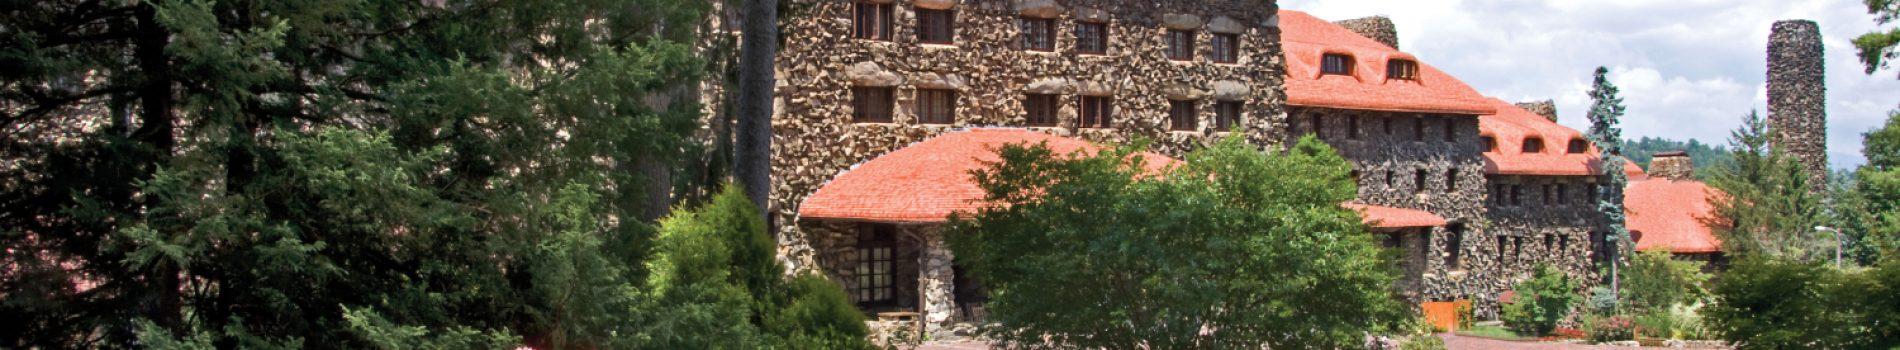 GPI Main Lodge CREDIT Omni Grove Park Inn